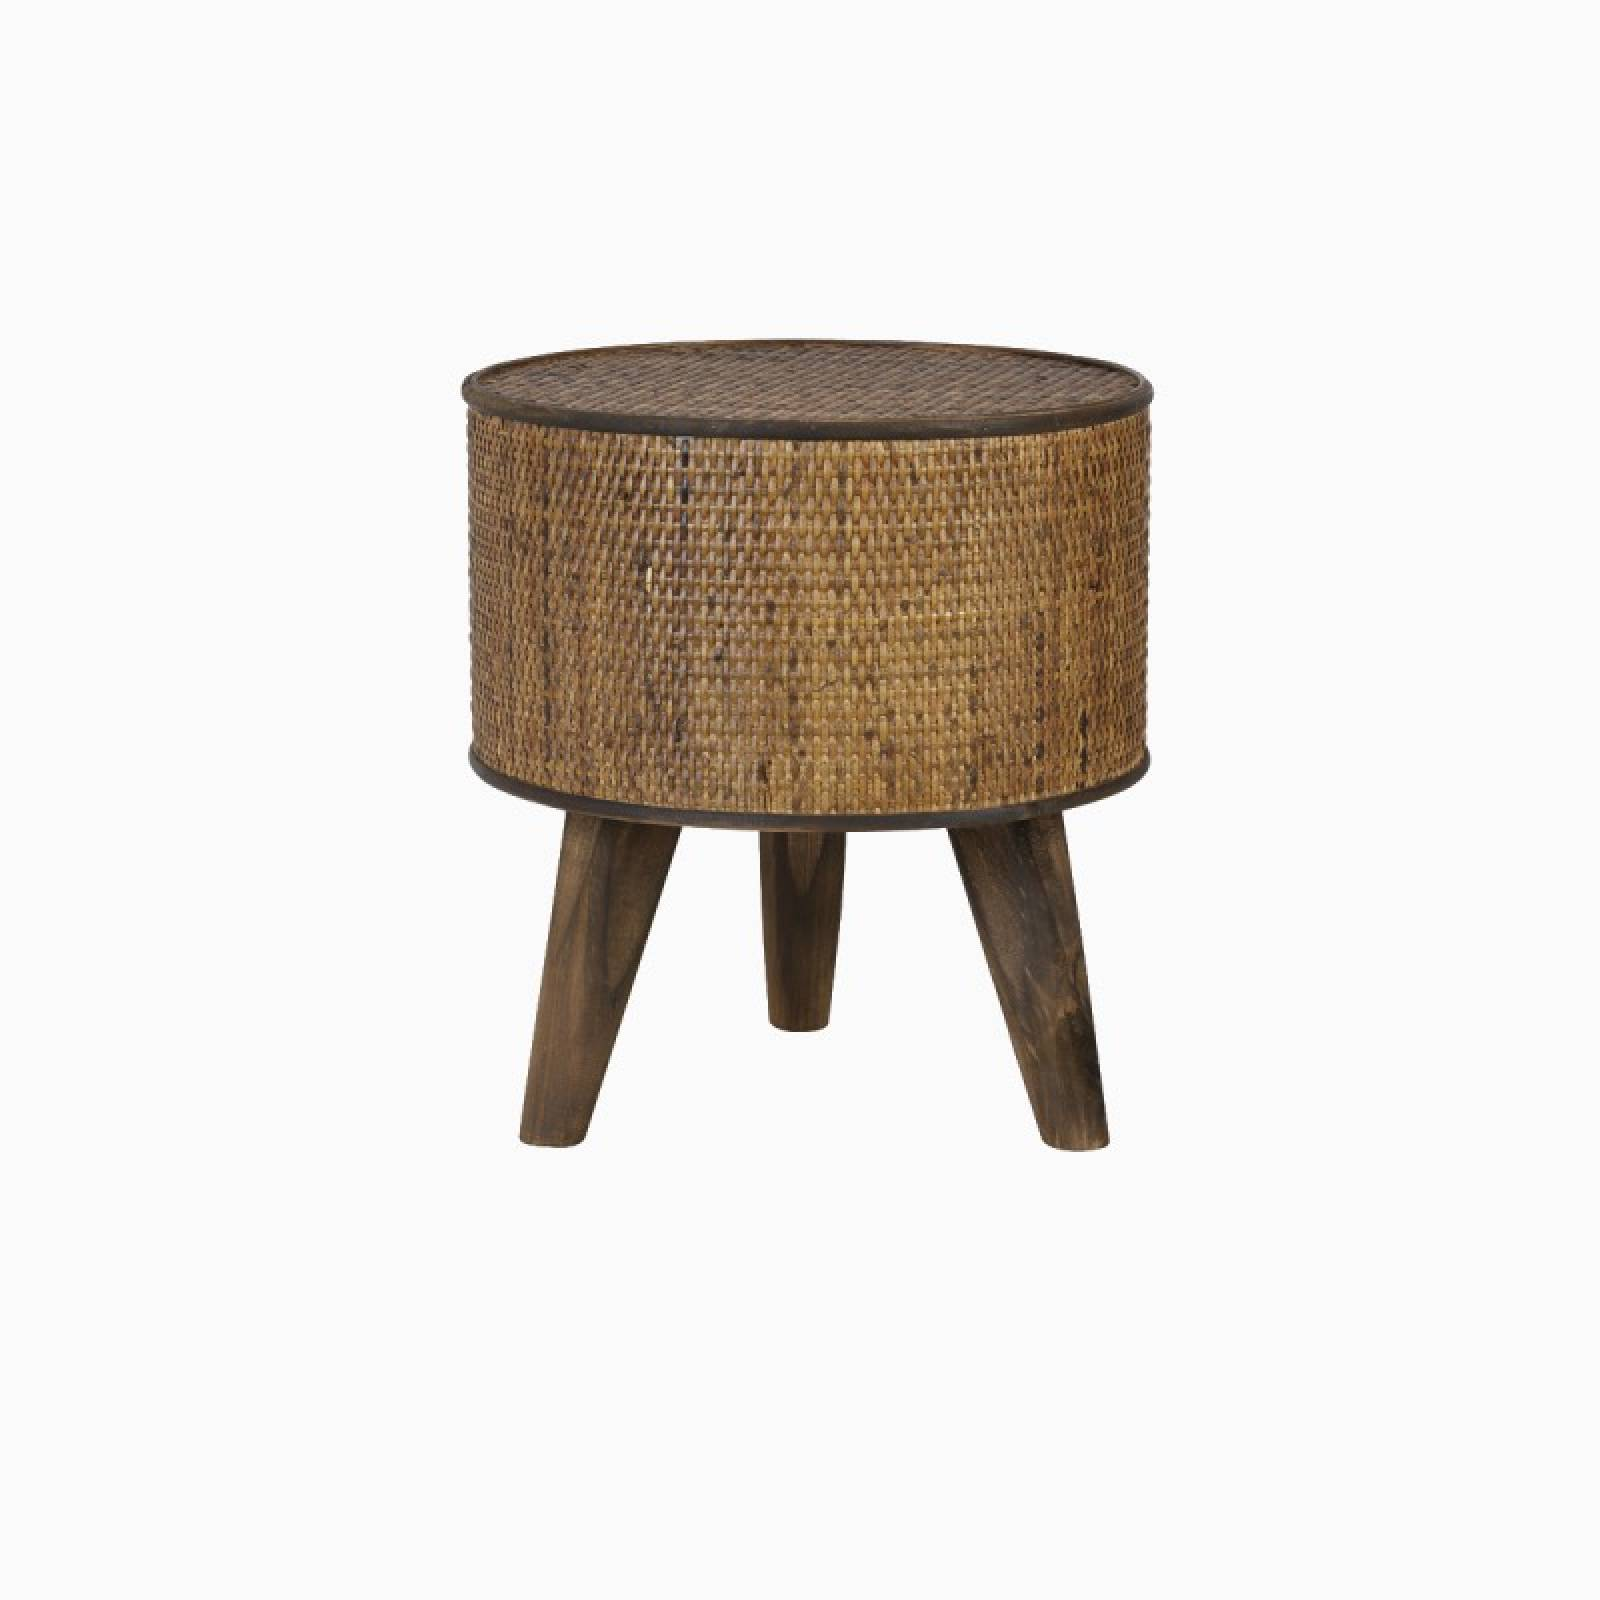 Canya Circular Woven Cane Side Table In Dark